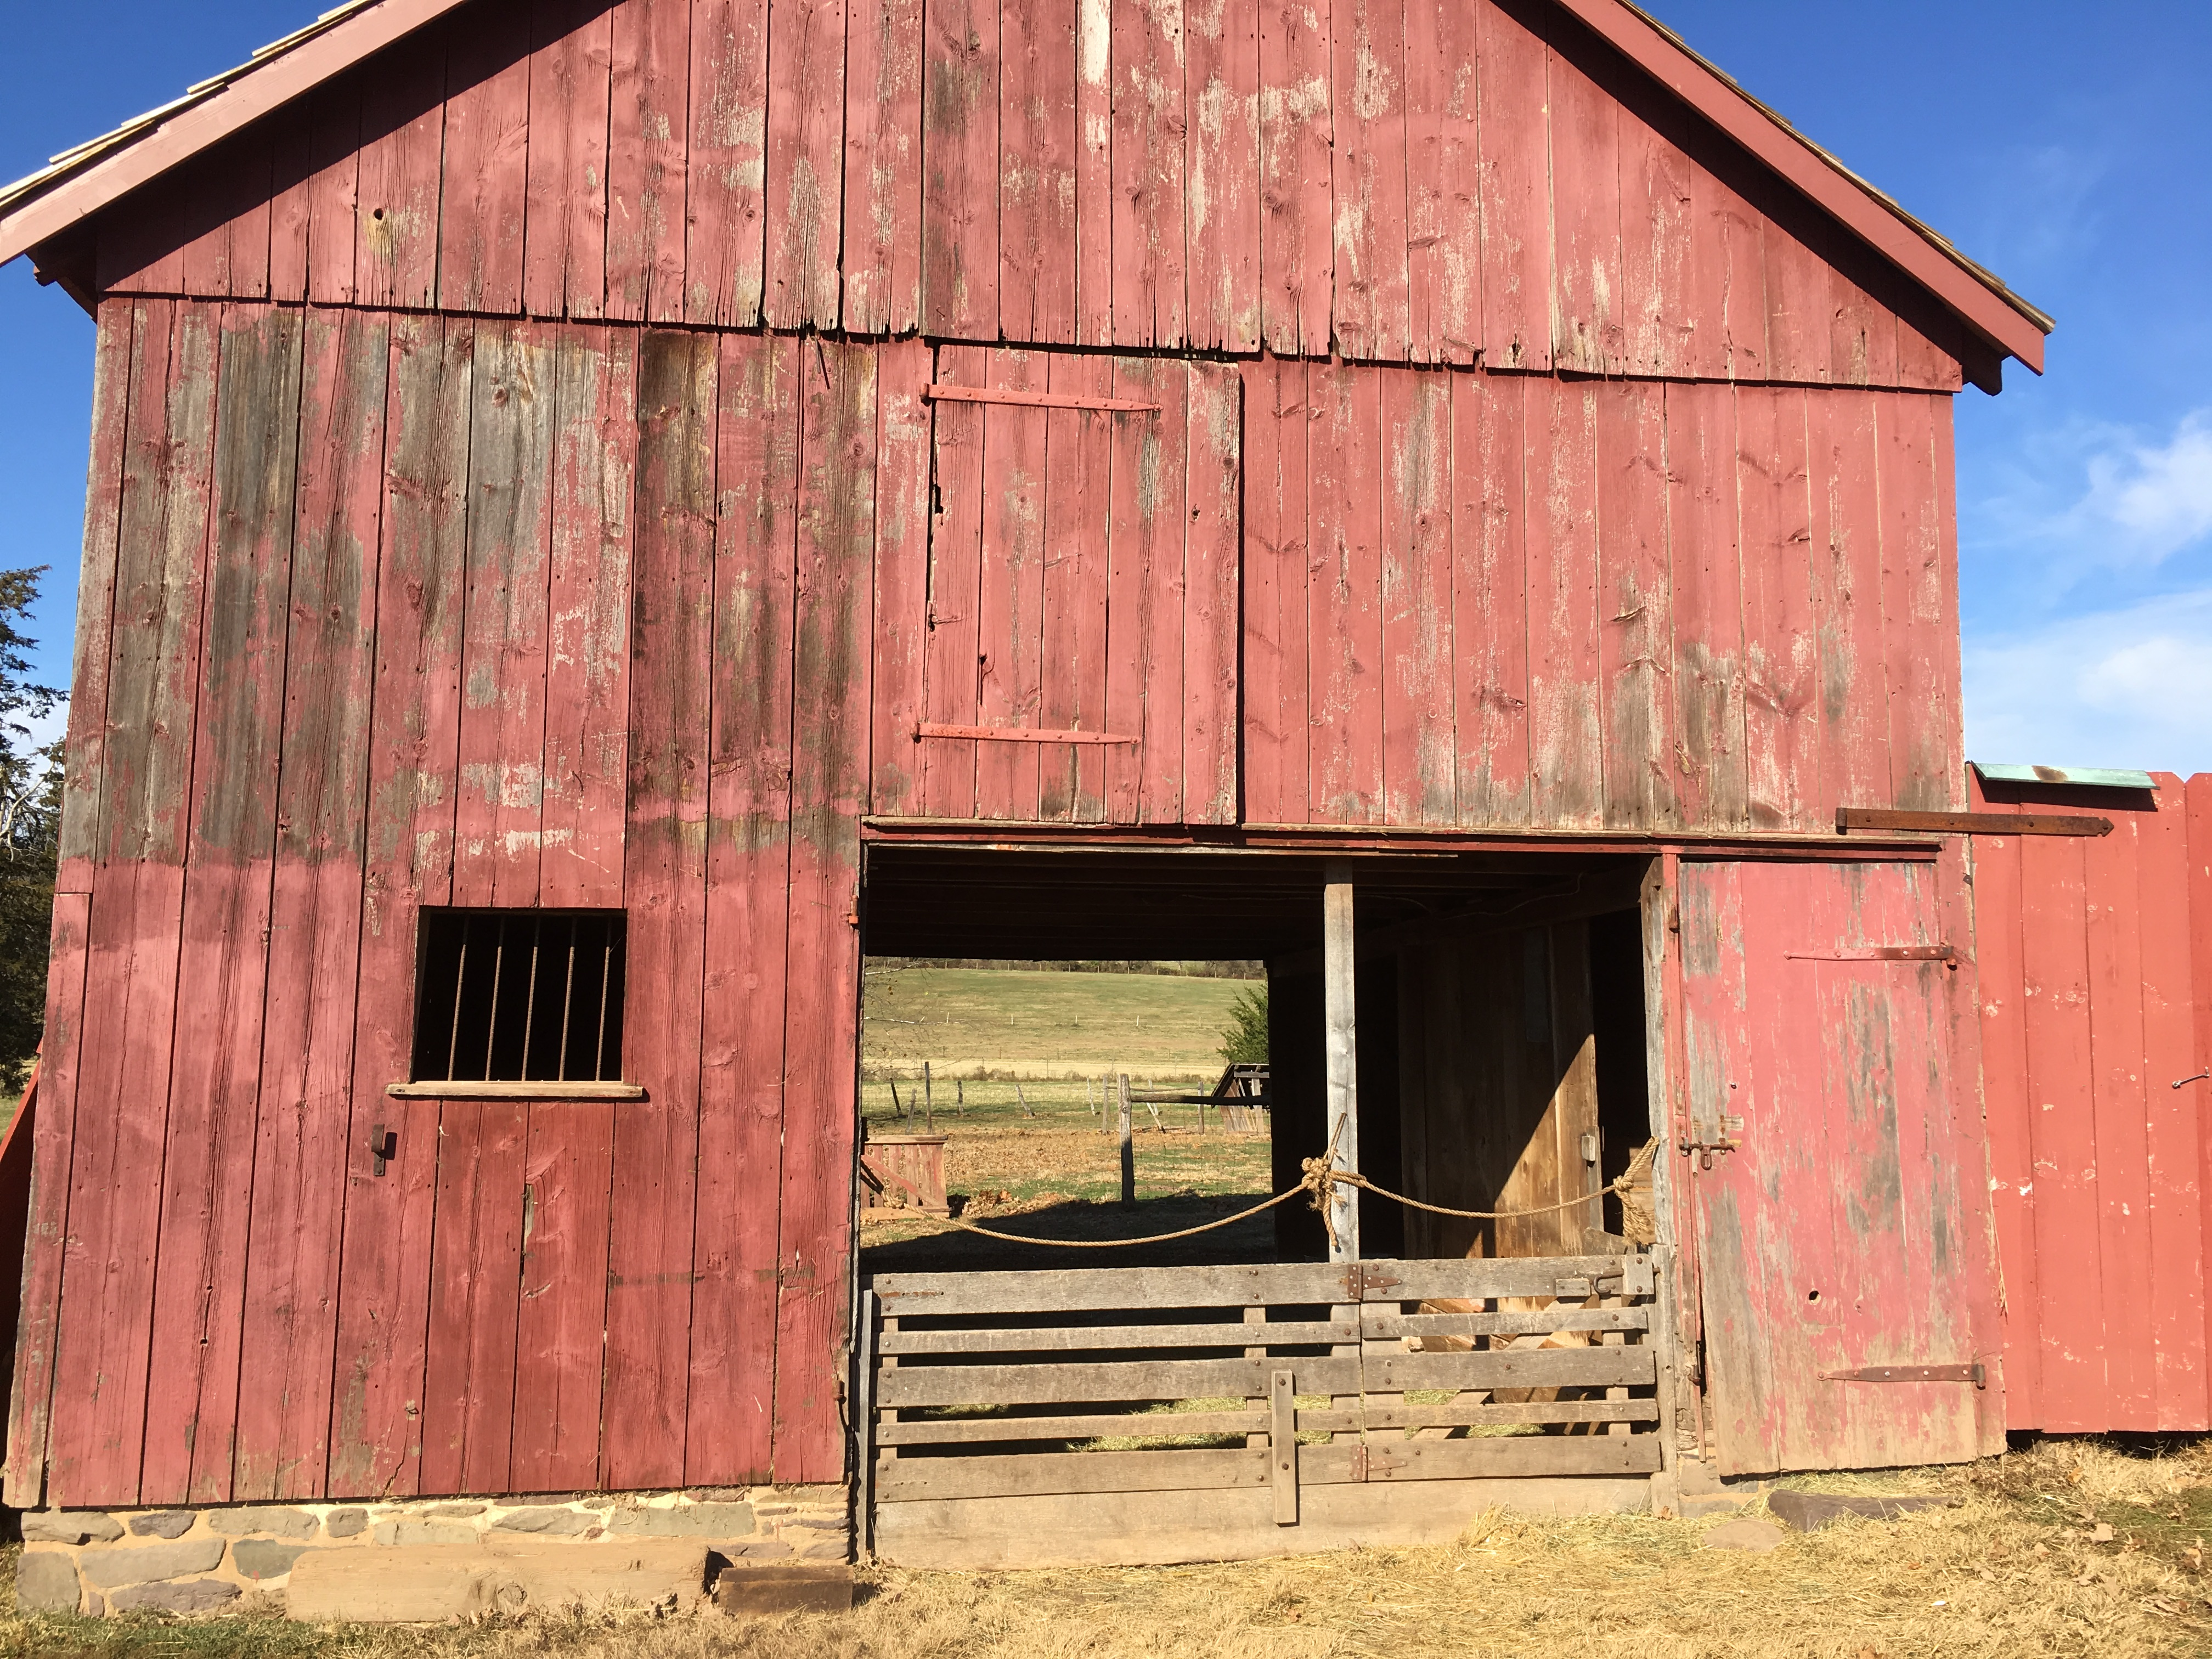 File:Howell Living History Farm barn door open, image 2 ...